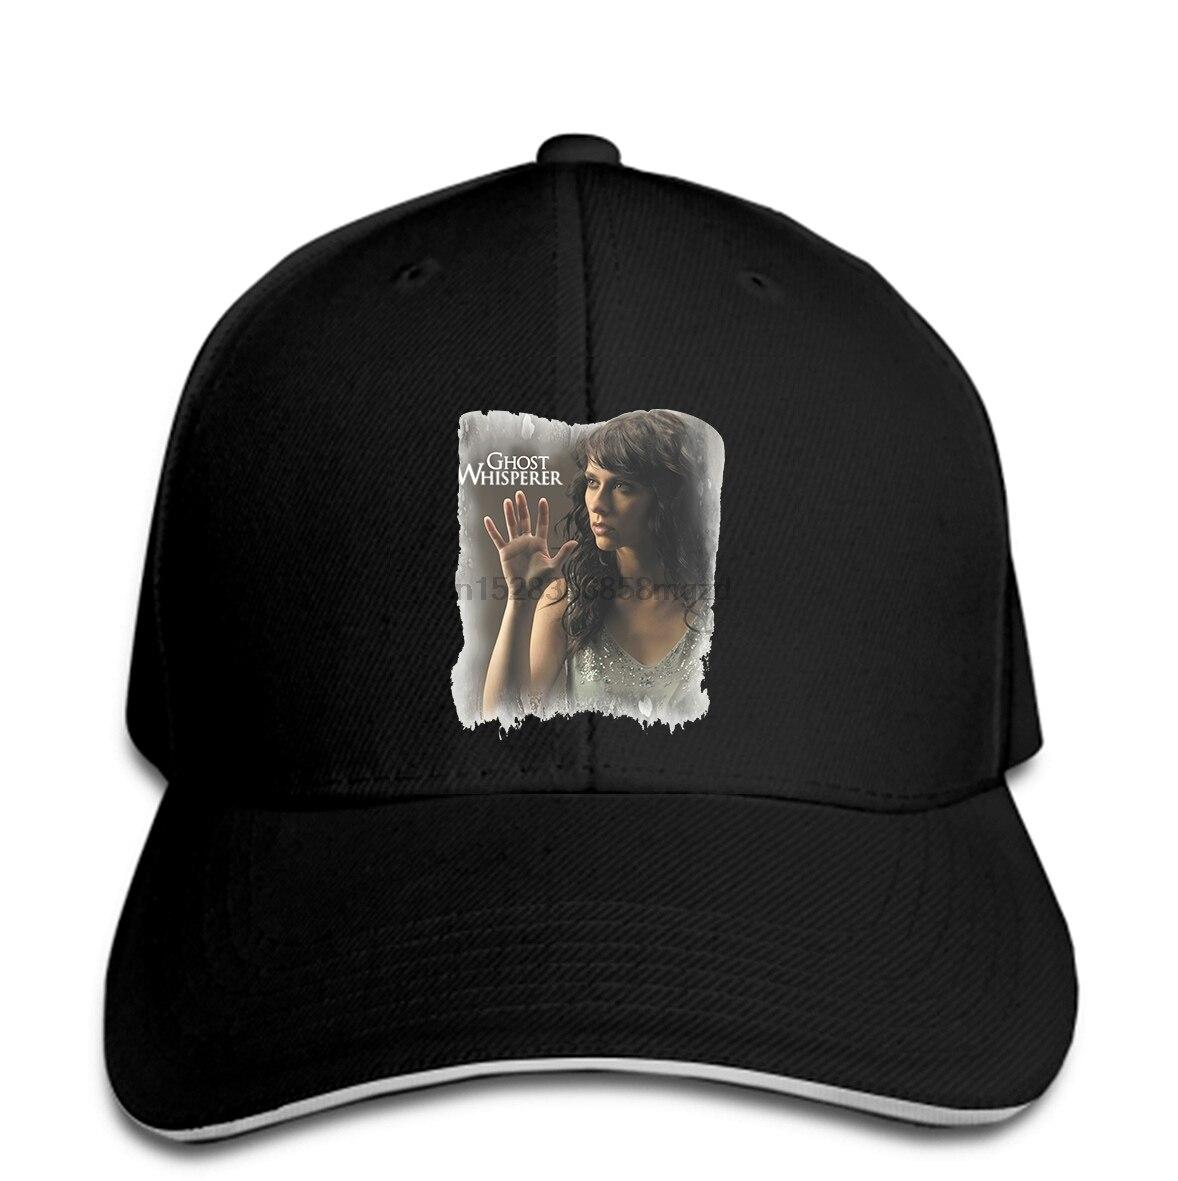 Ghost Whisperer etéreo hombres Premium hombres gorra de béisbol gorra Snapback mujeres sombrero pico